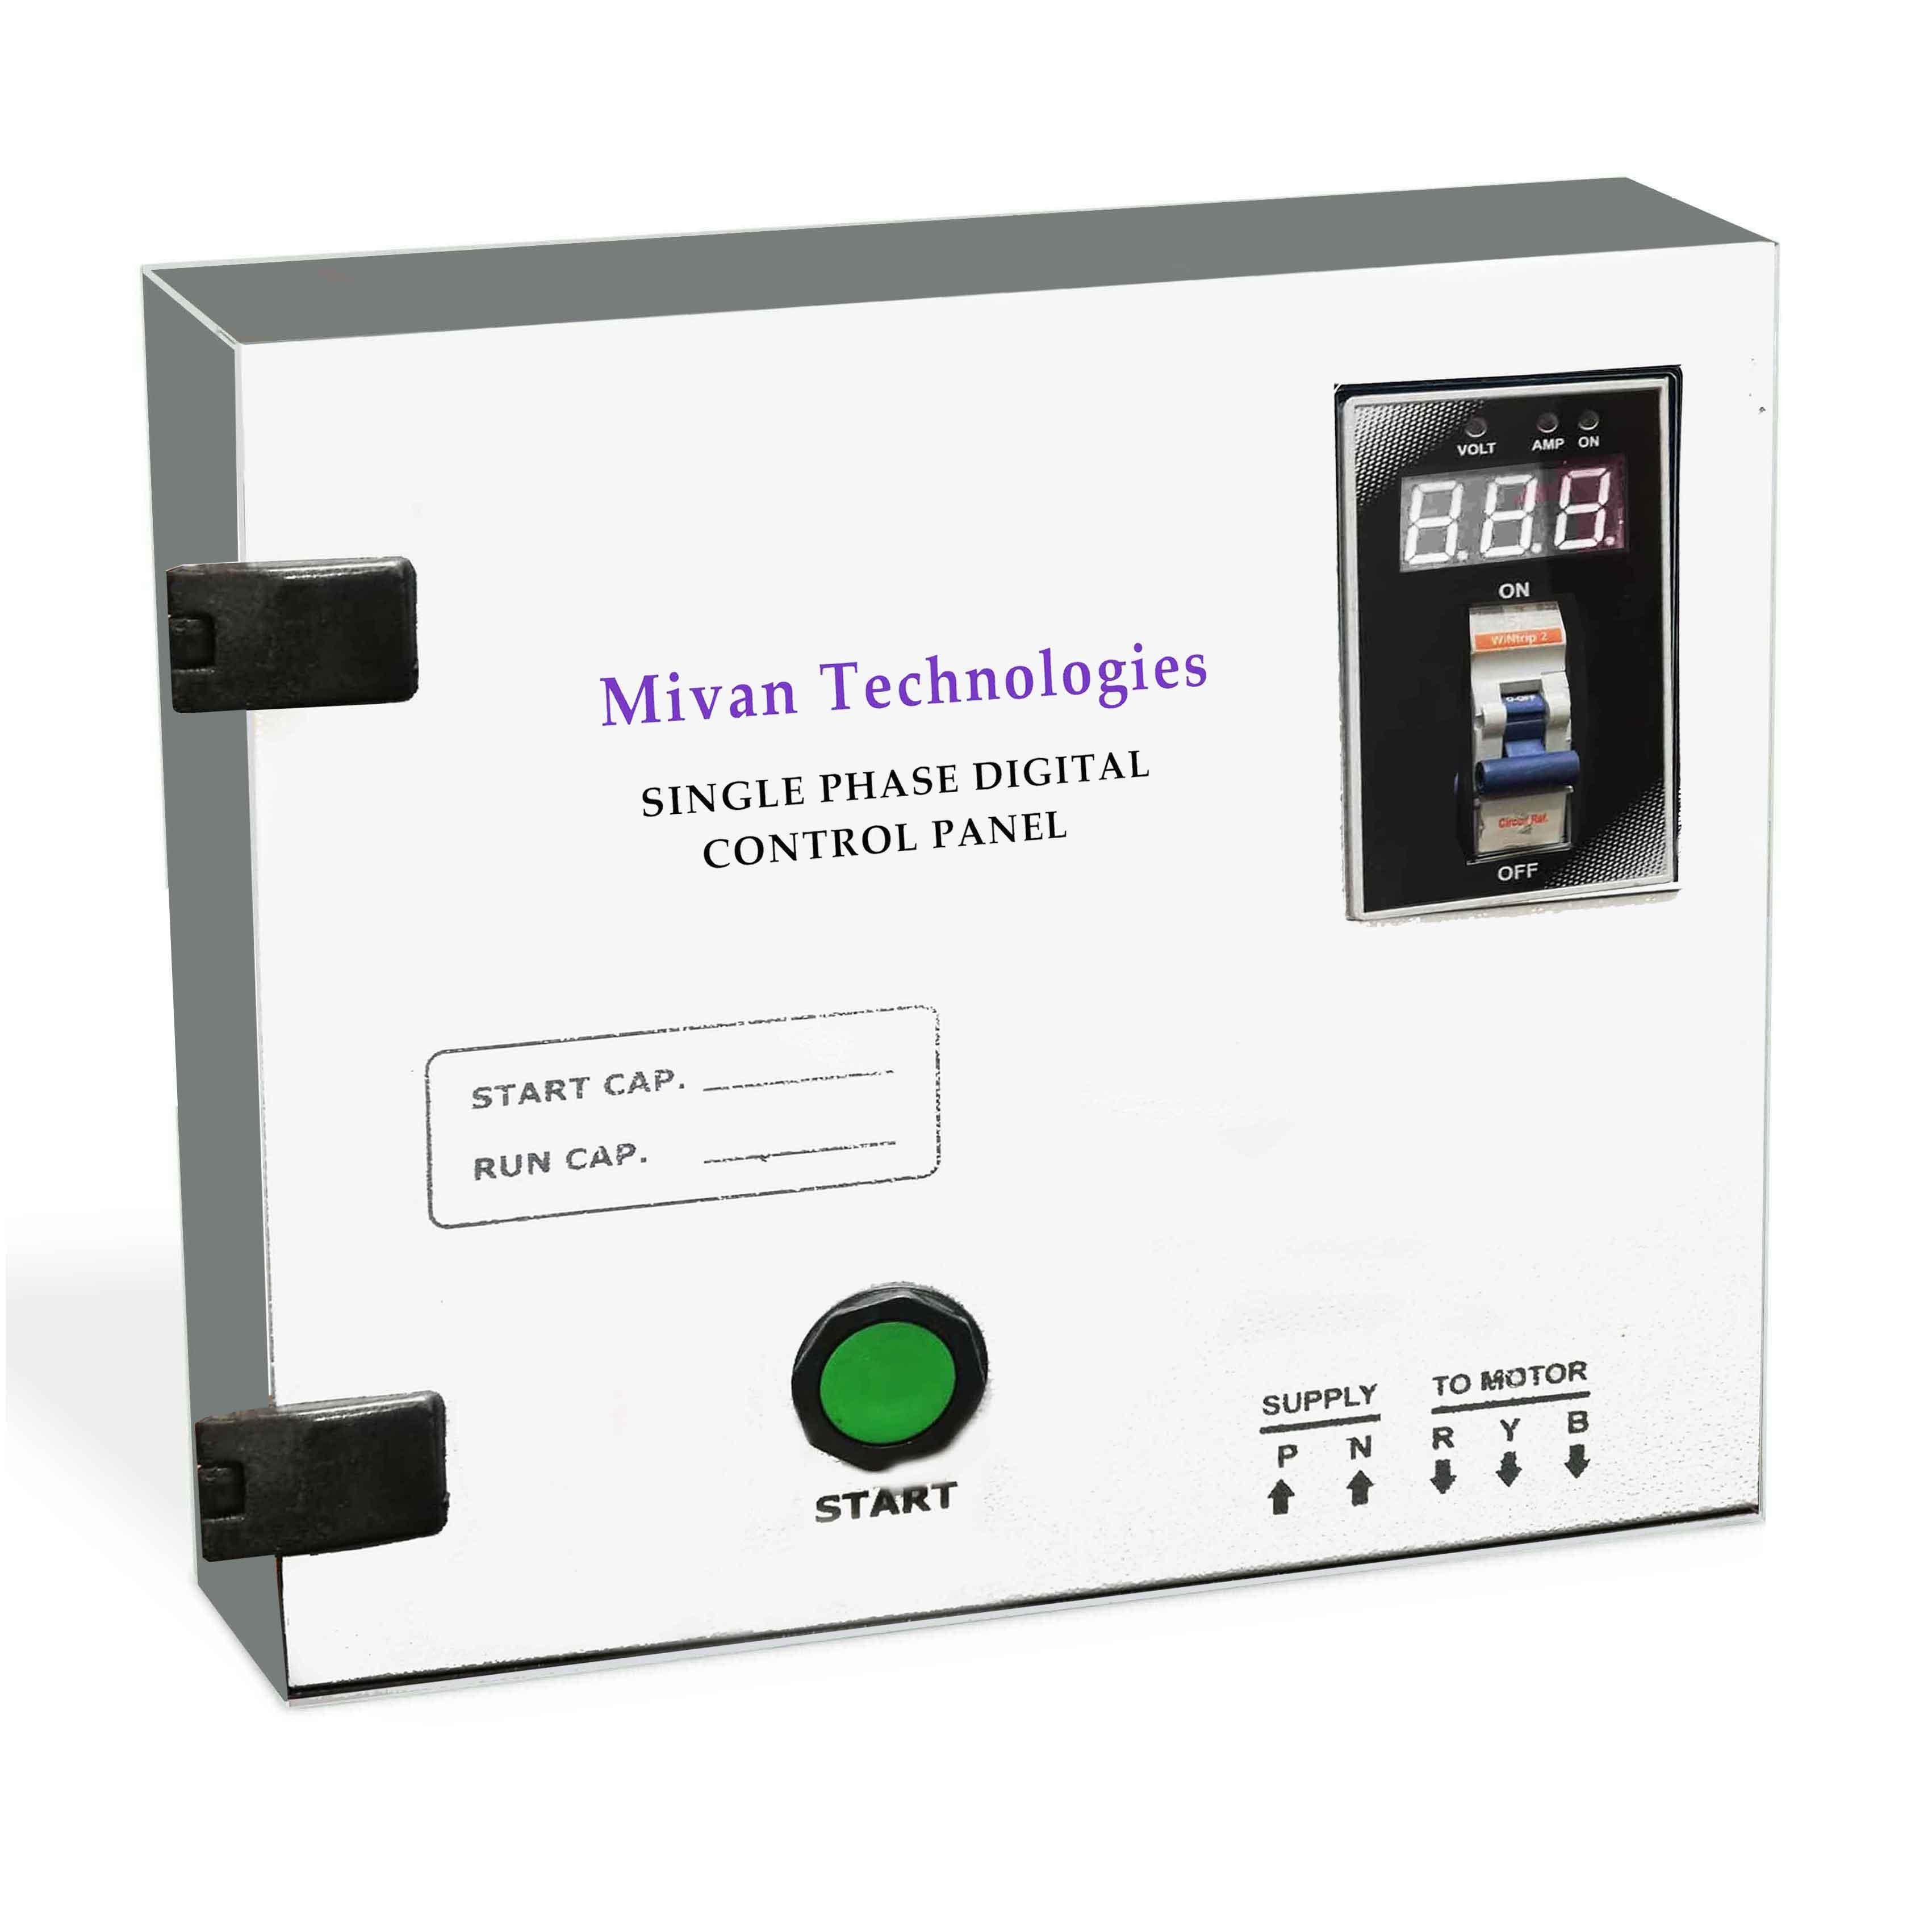 https://mivan.co.in/assets/img/product/15737320850_287_131333.jpg